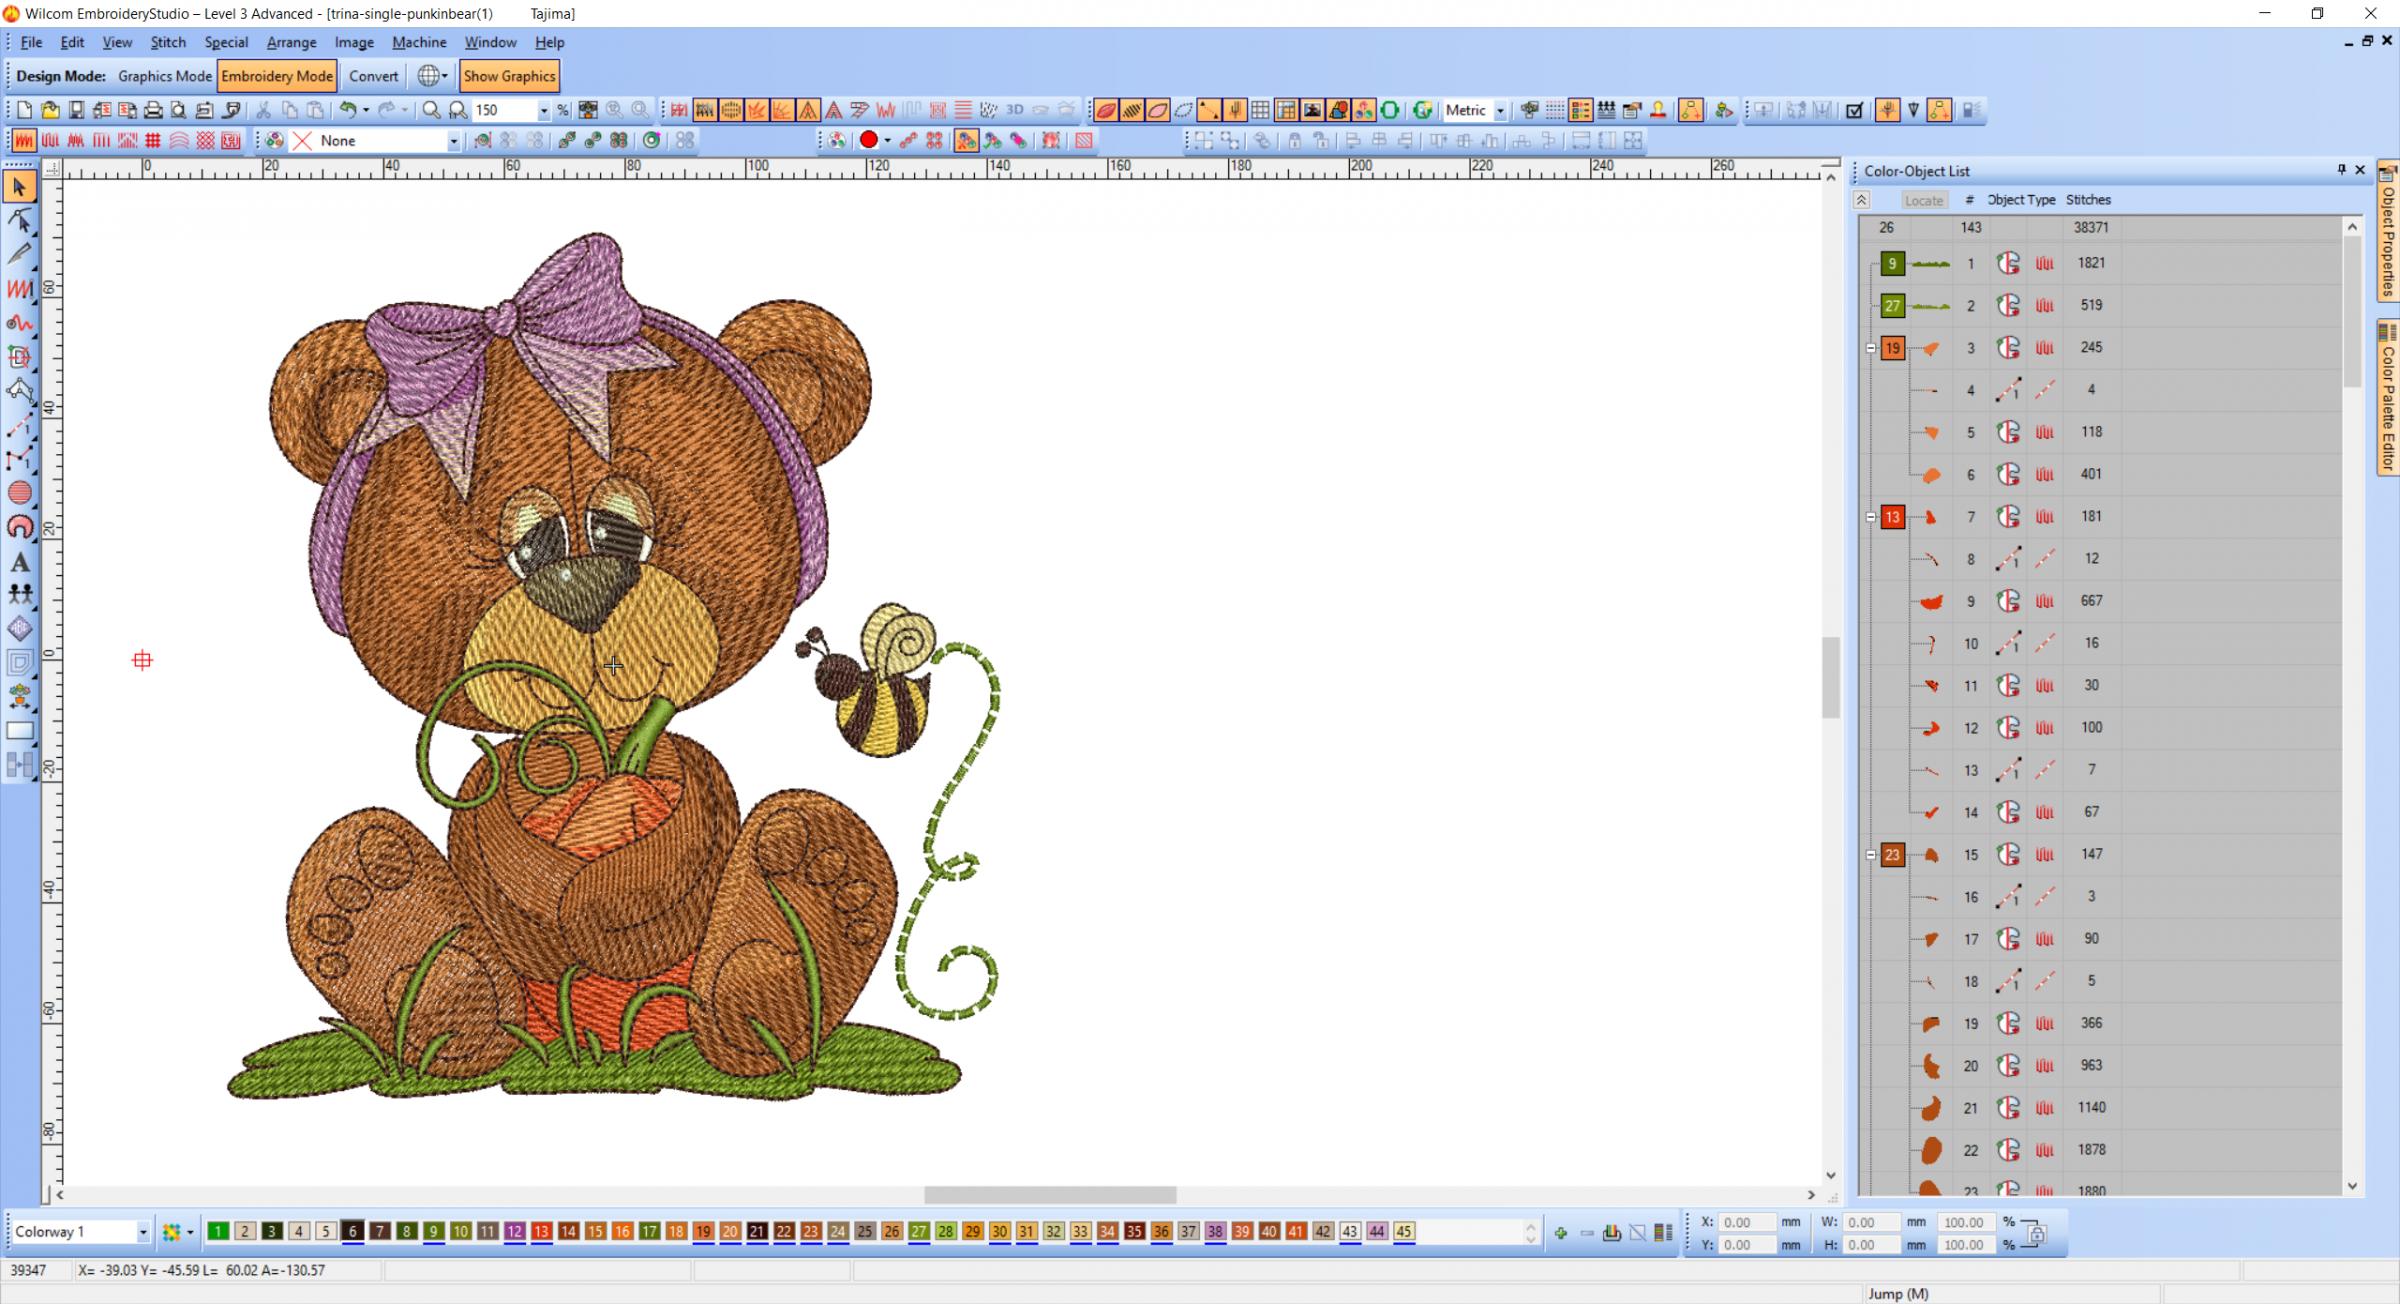 Teddy Bear in garden embroidery design preview software